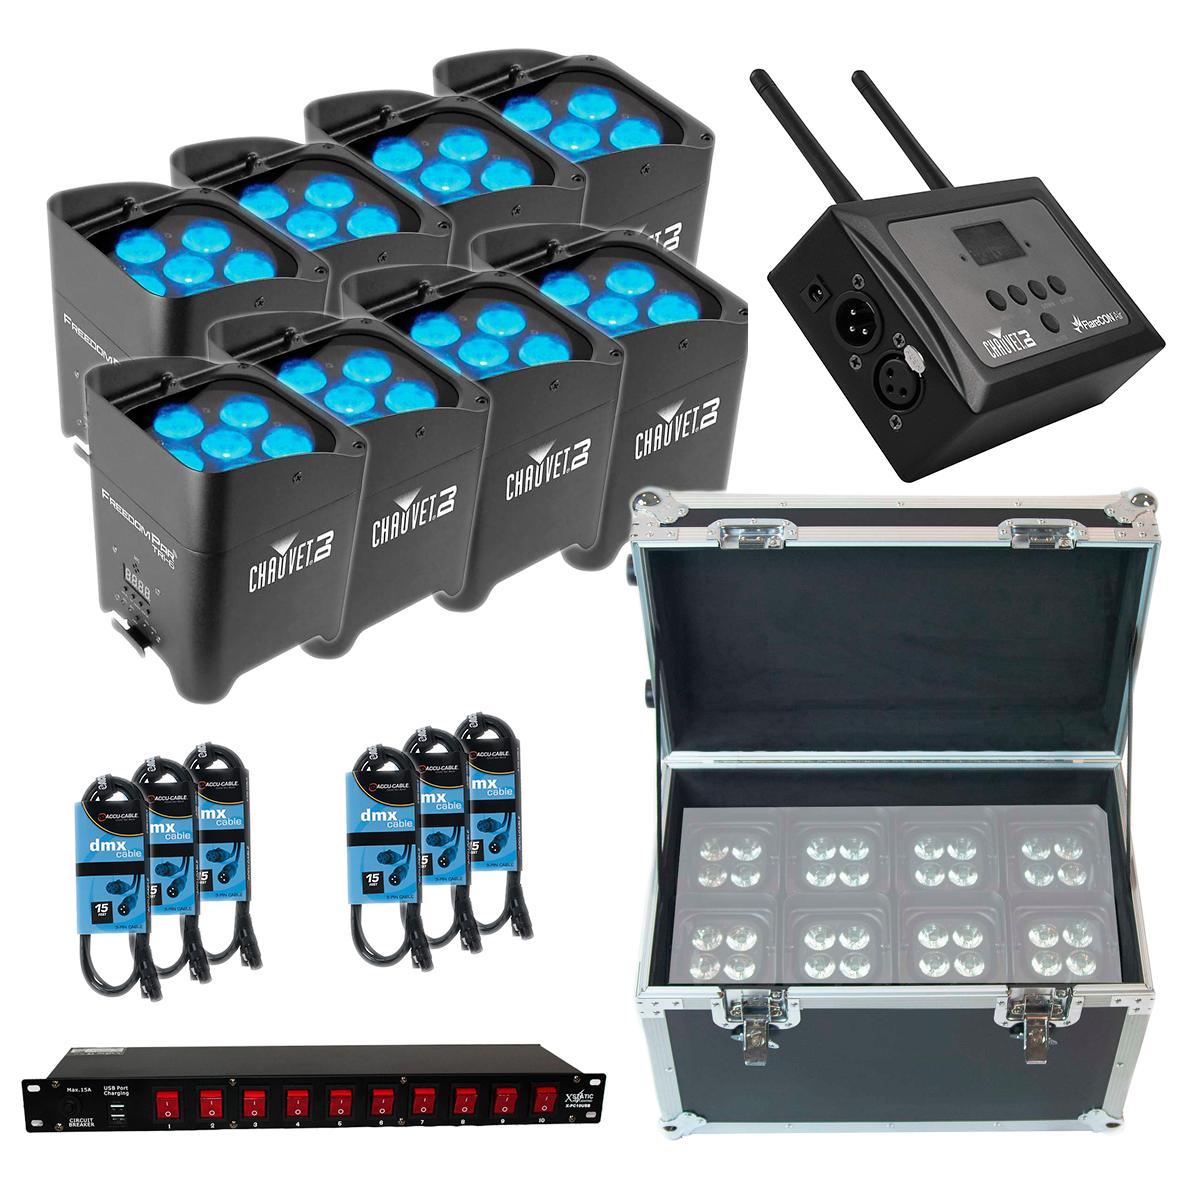 (8) Chauvet DJ Freedom Par Tri-6 - Chauvet DJ FlareCON Air - ProX T-UTIHW Roll-Away Utility Case - Xstatic X-PC10USB 10 Plug Power Conditioner - 6 DMX 15FT Cable